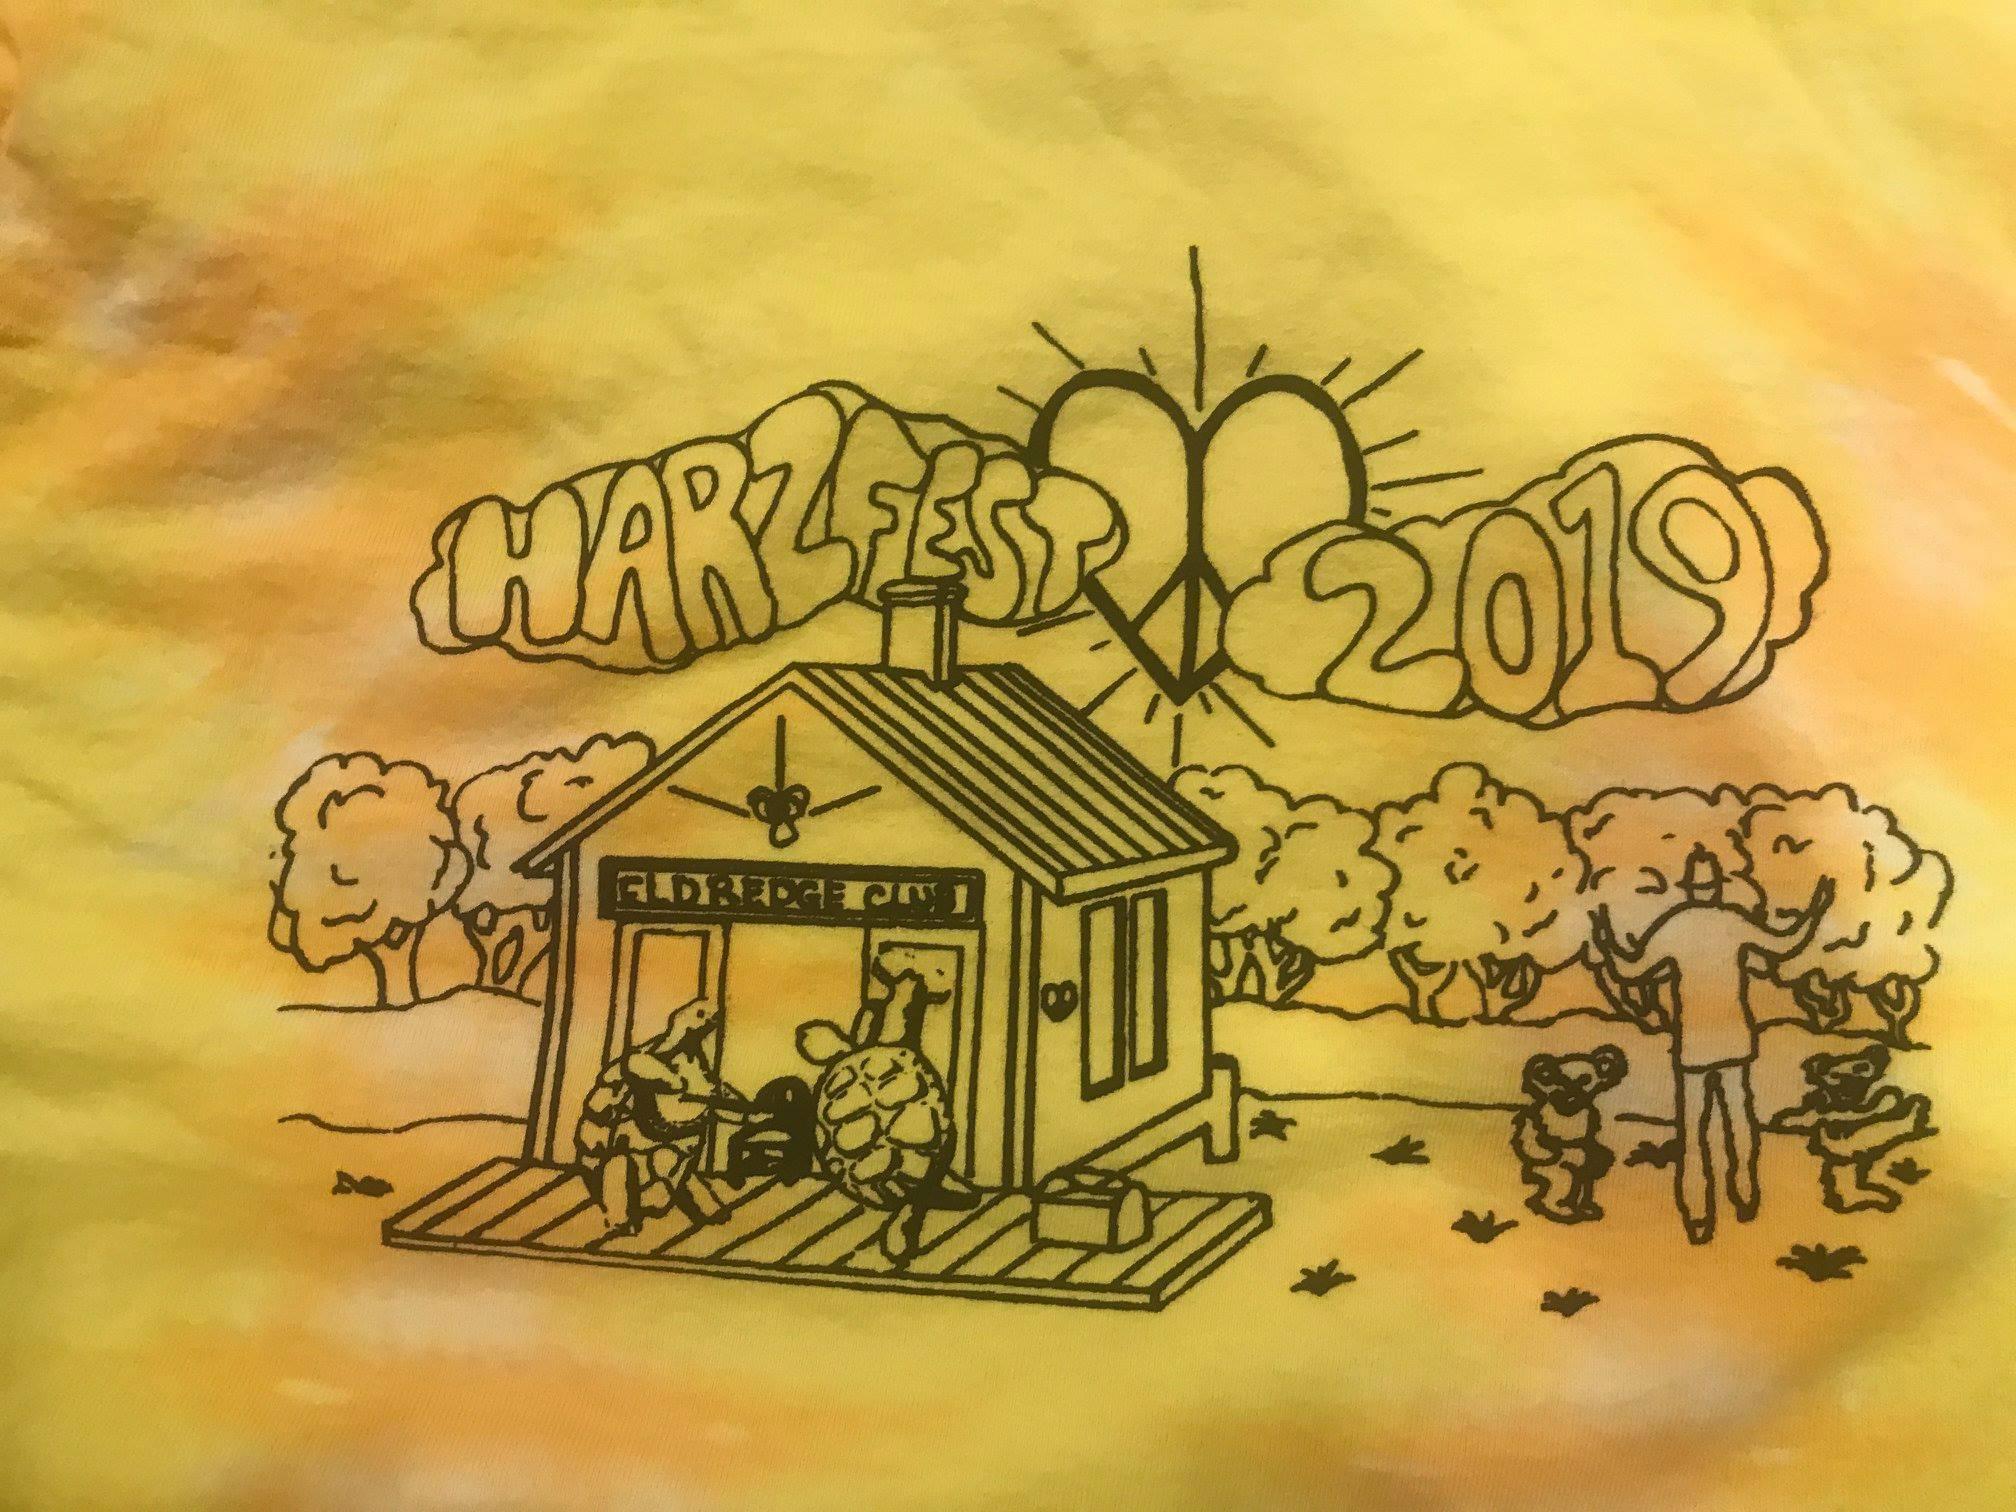 Harzfest2019 T shirt.jpg